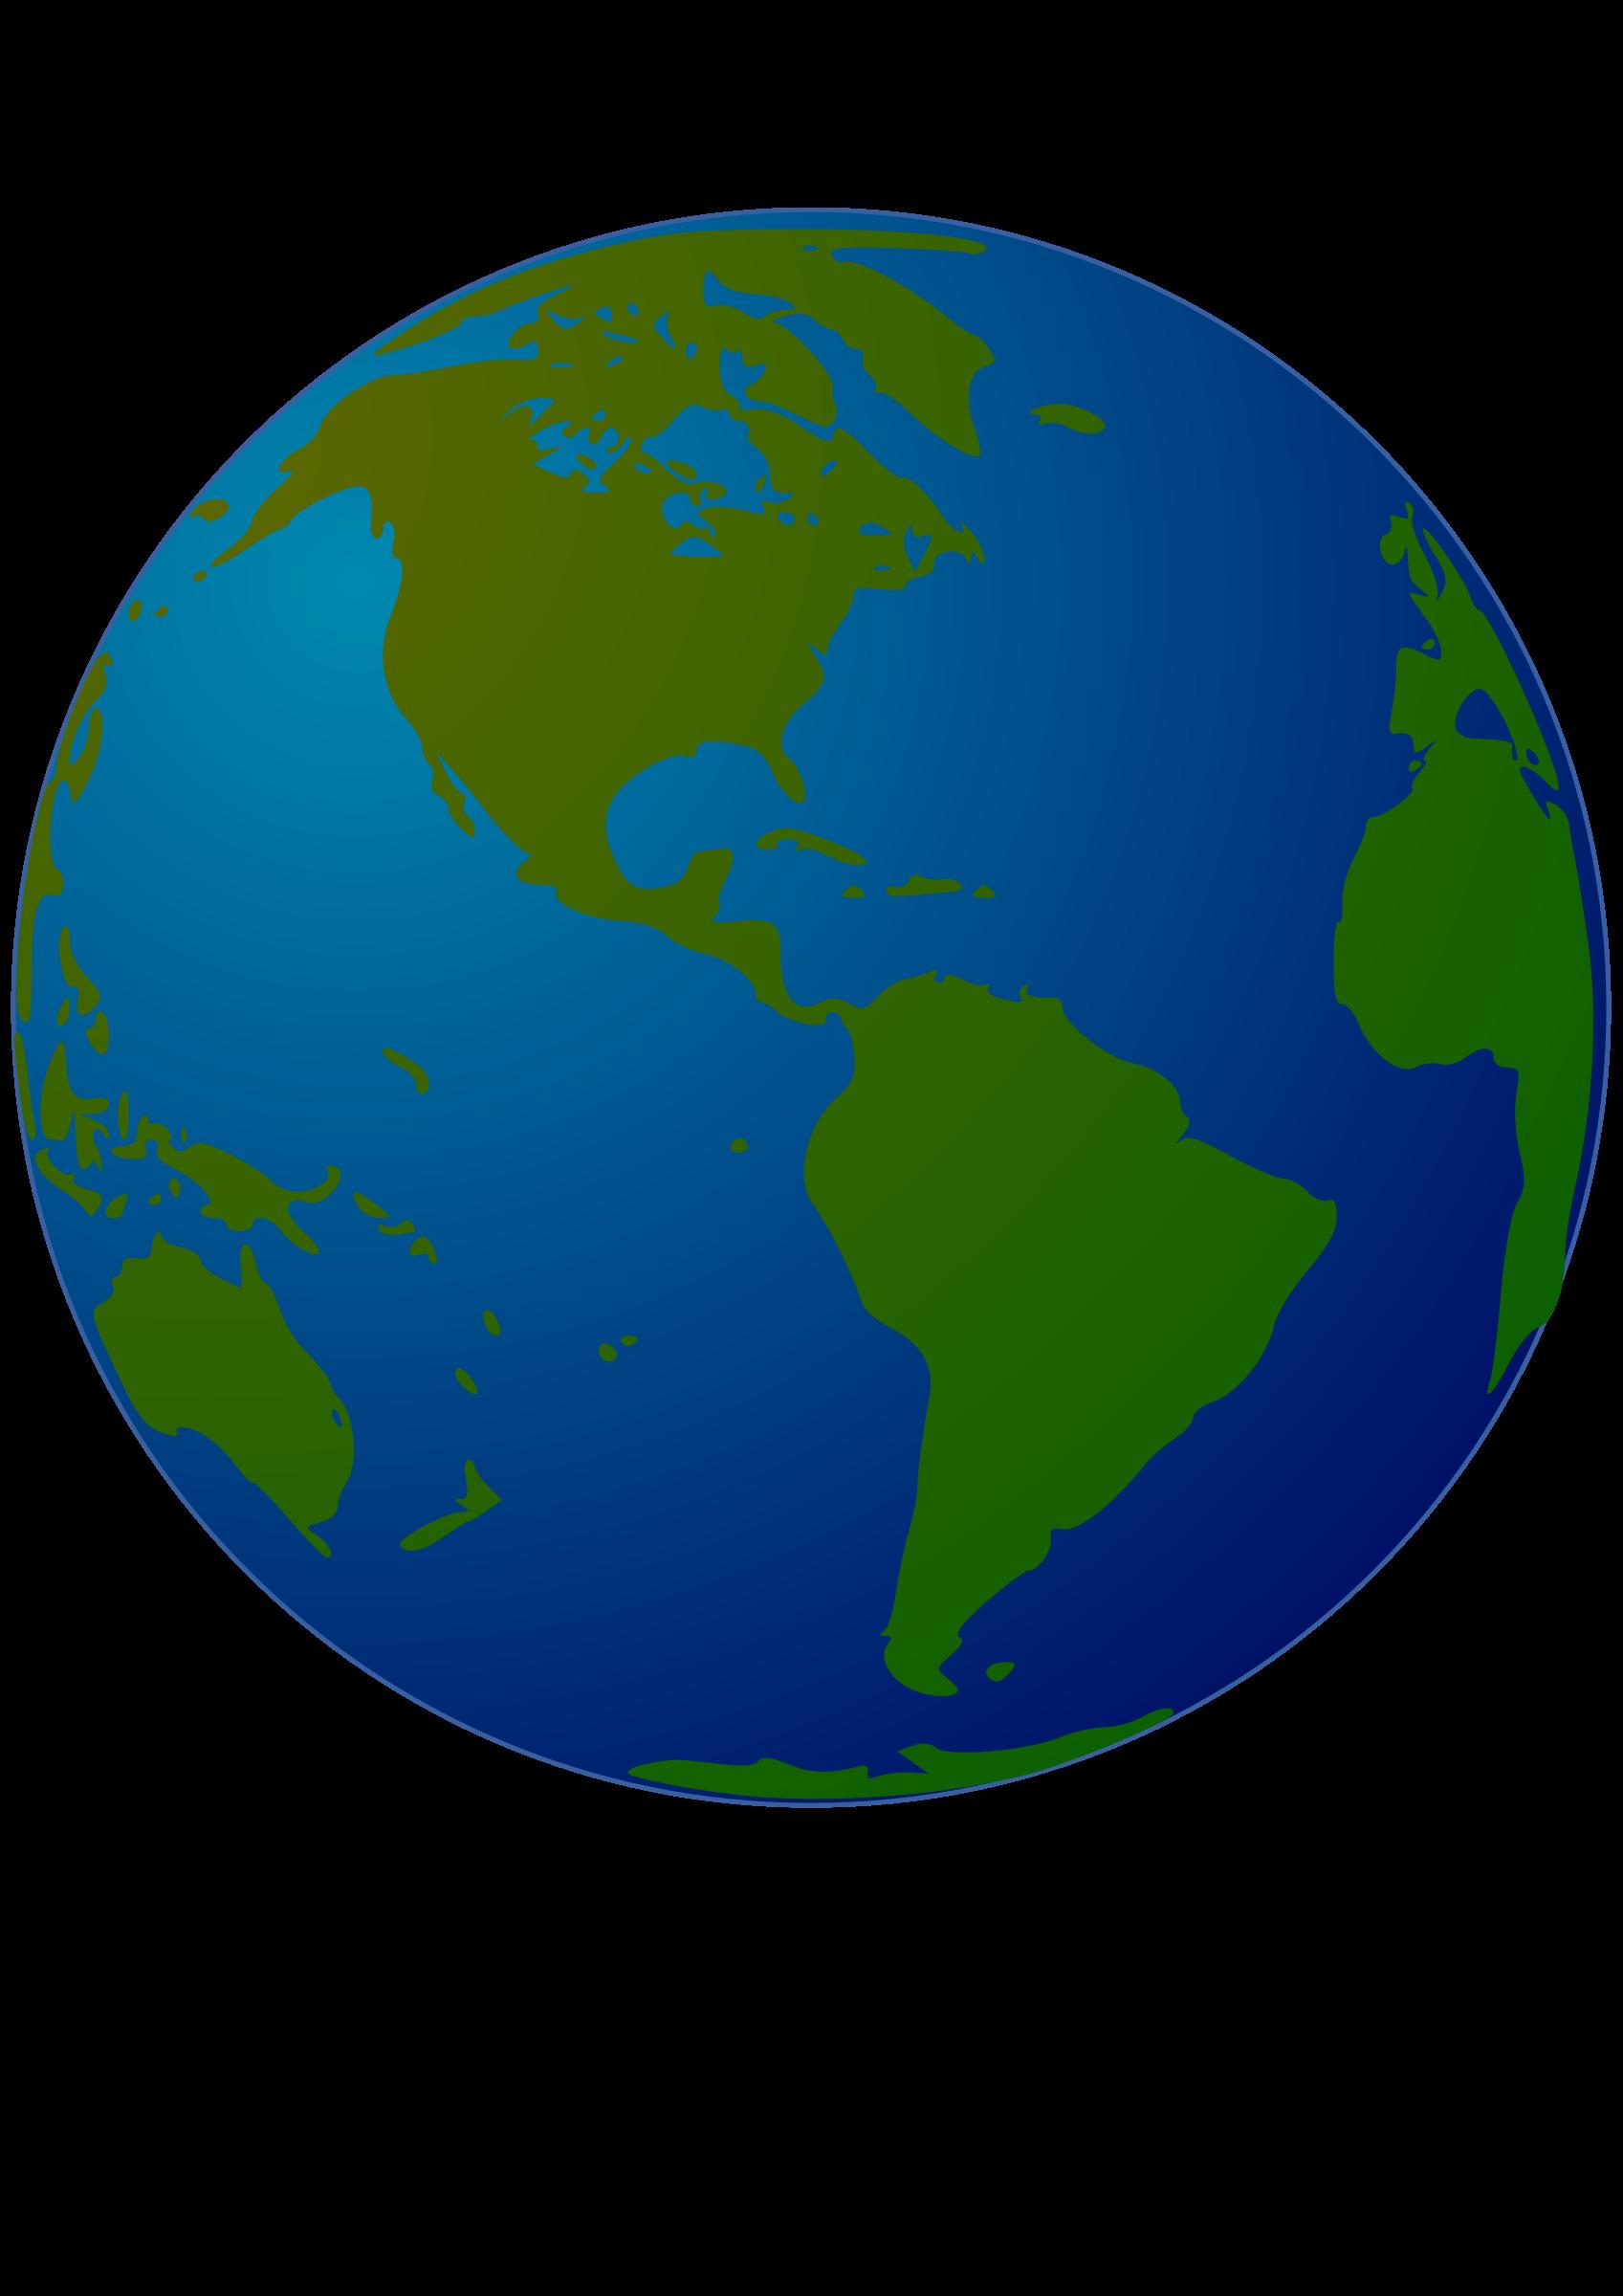 Globe big image png. Clipart world globle